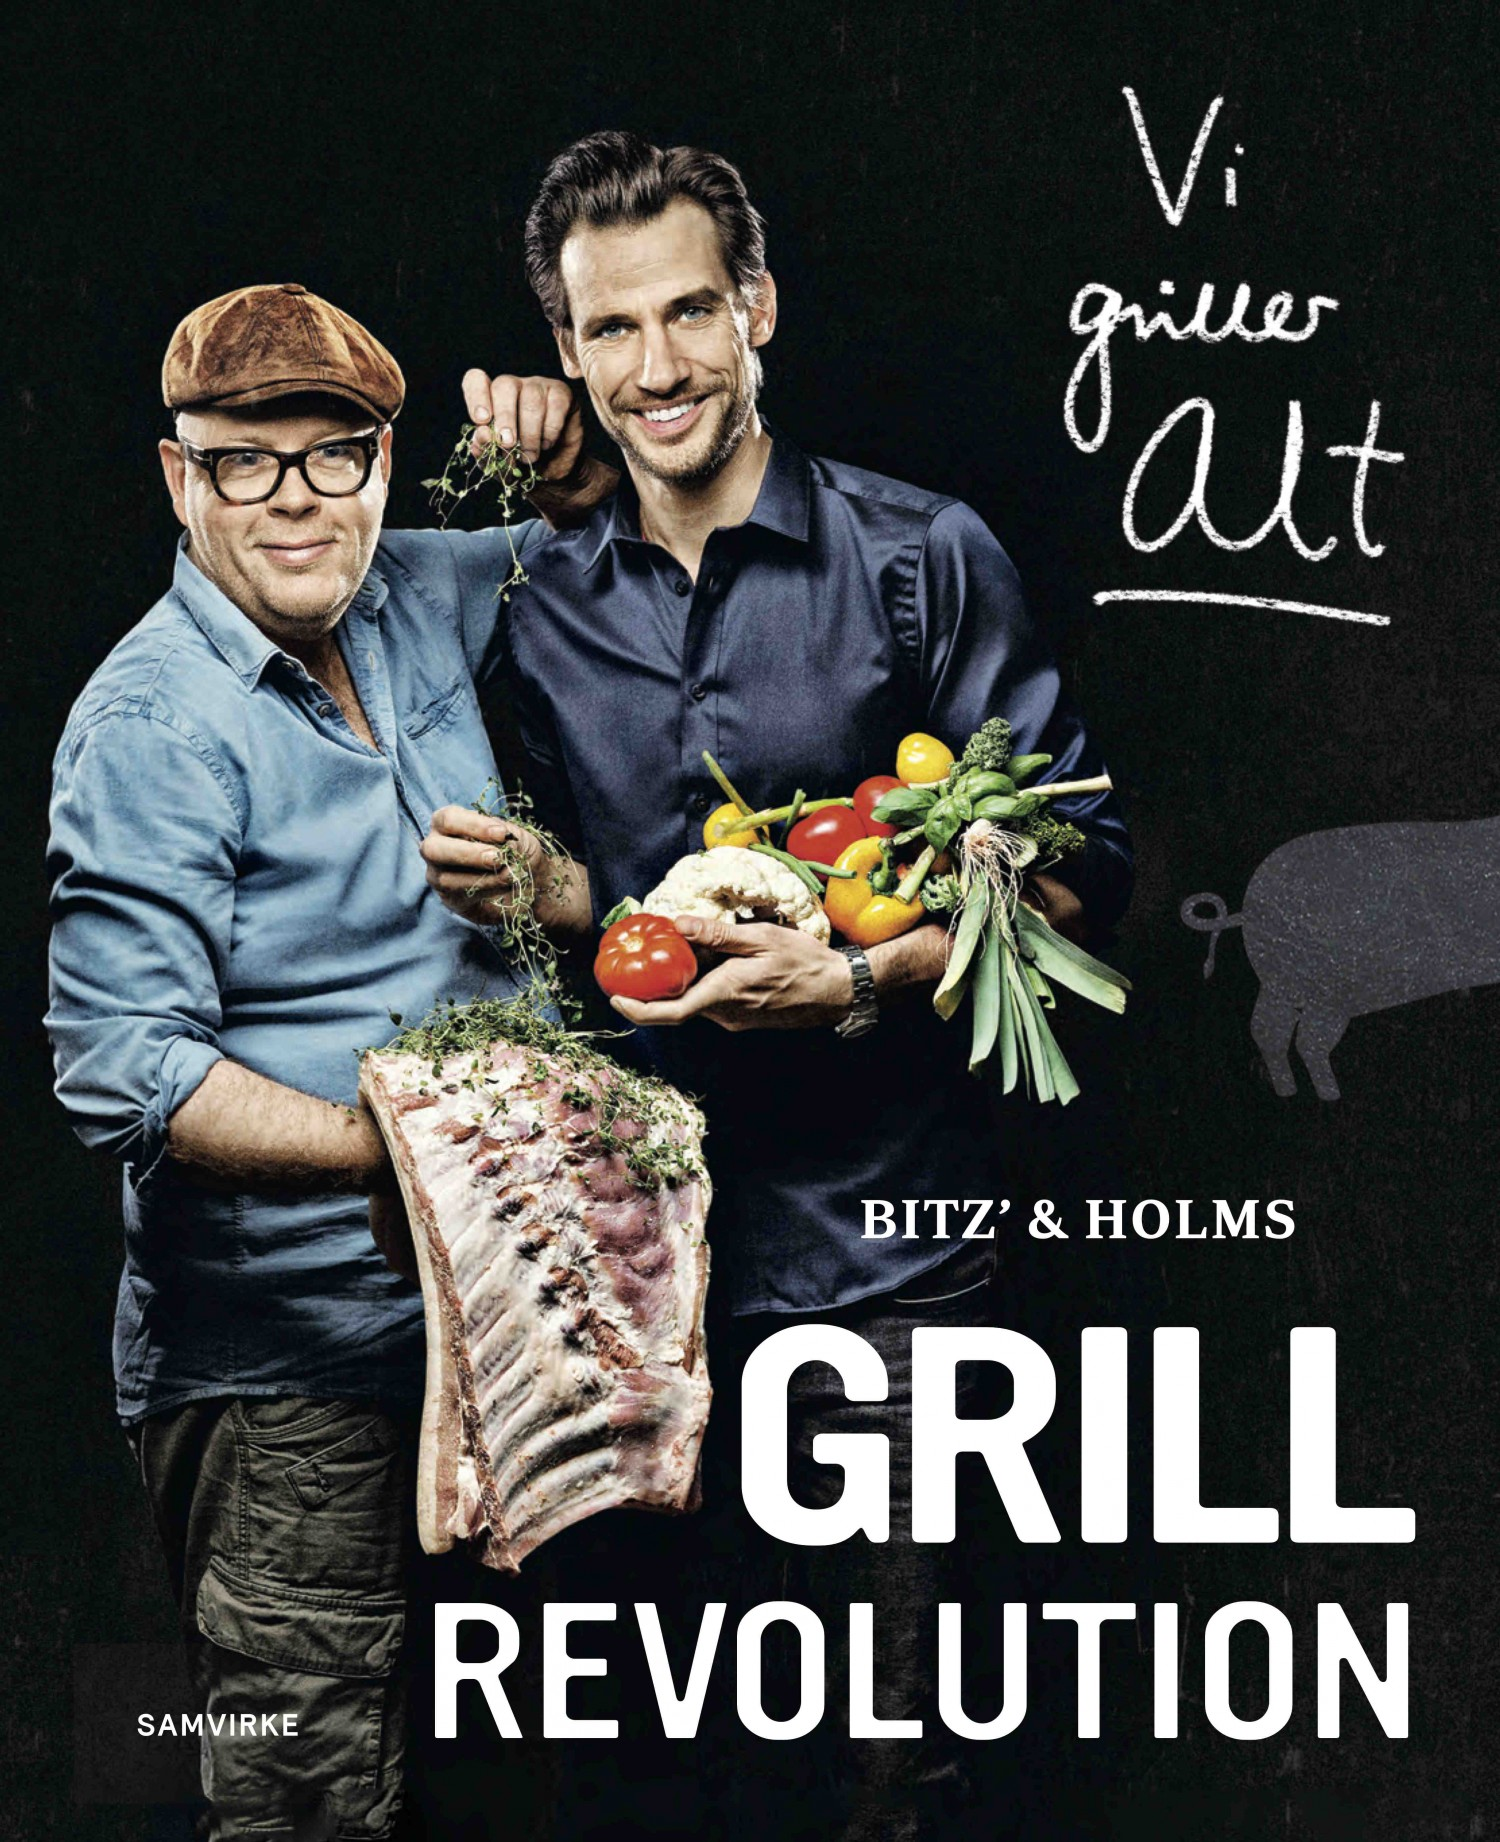 Bitz' og Holms Grillrevolution - forside